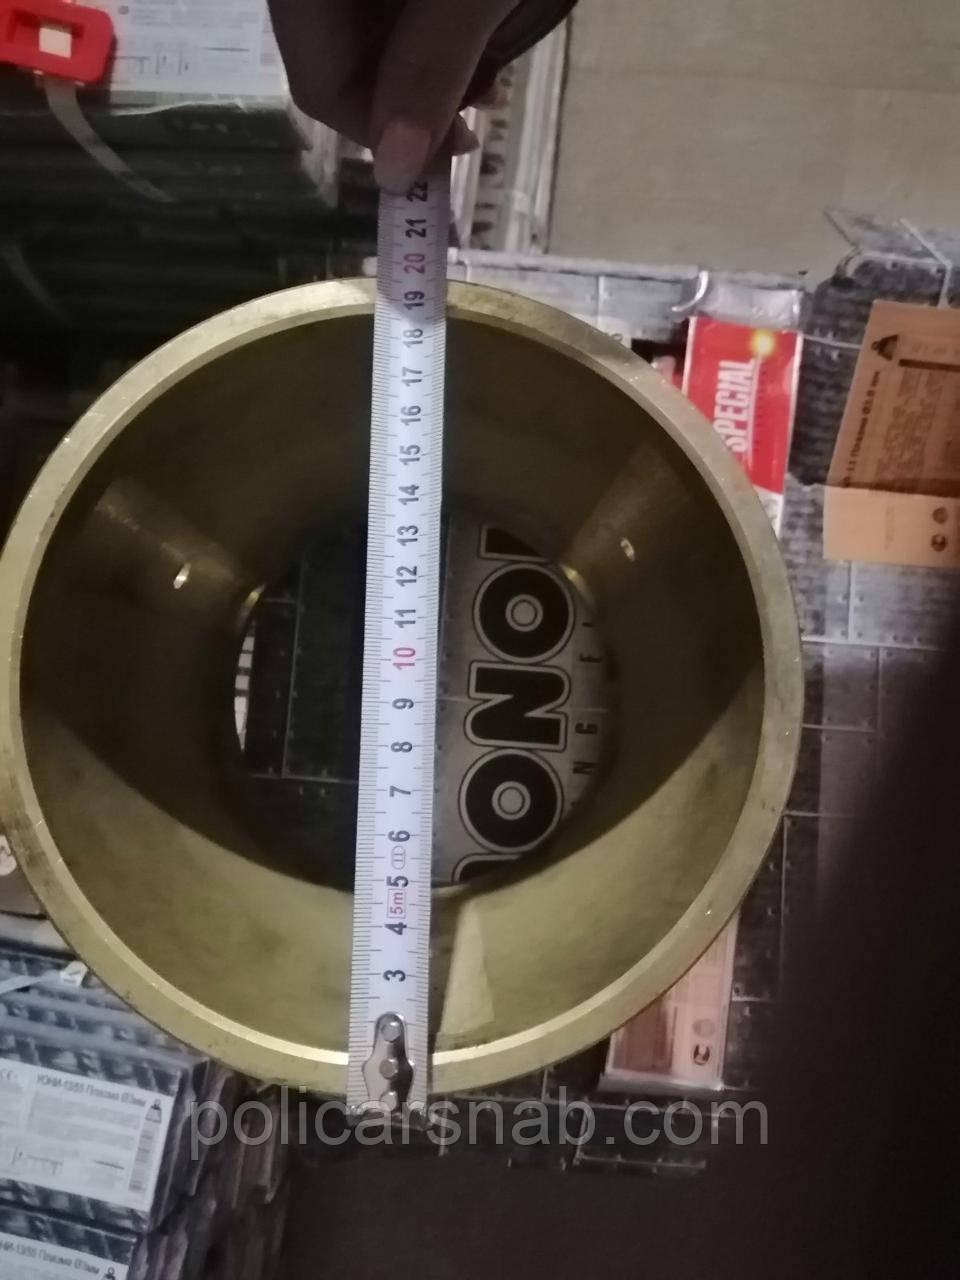 Втулка опорного колеса 1080.33.32 на экскаватор ЭКГ-5 200х180х240